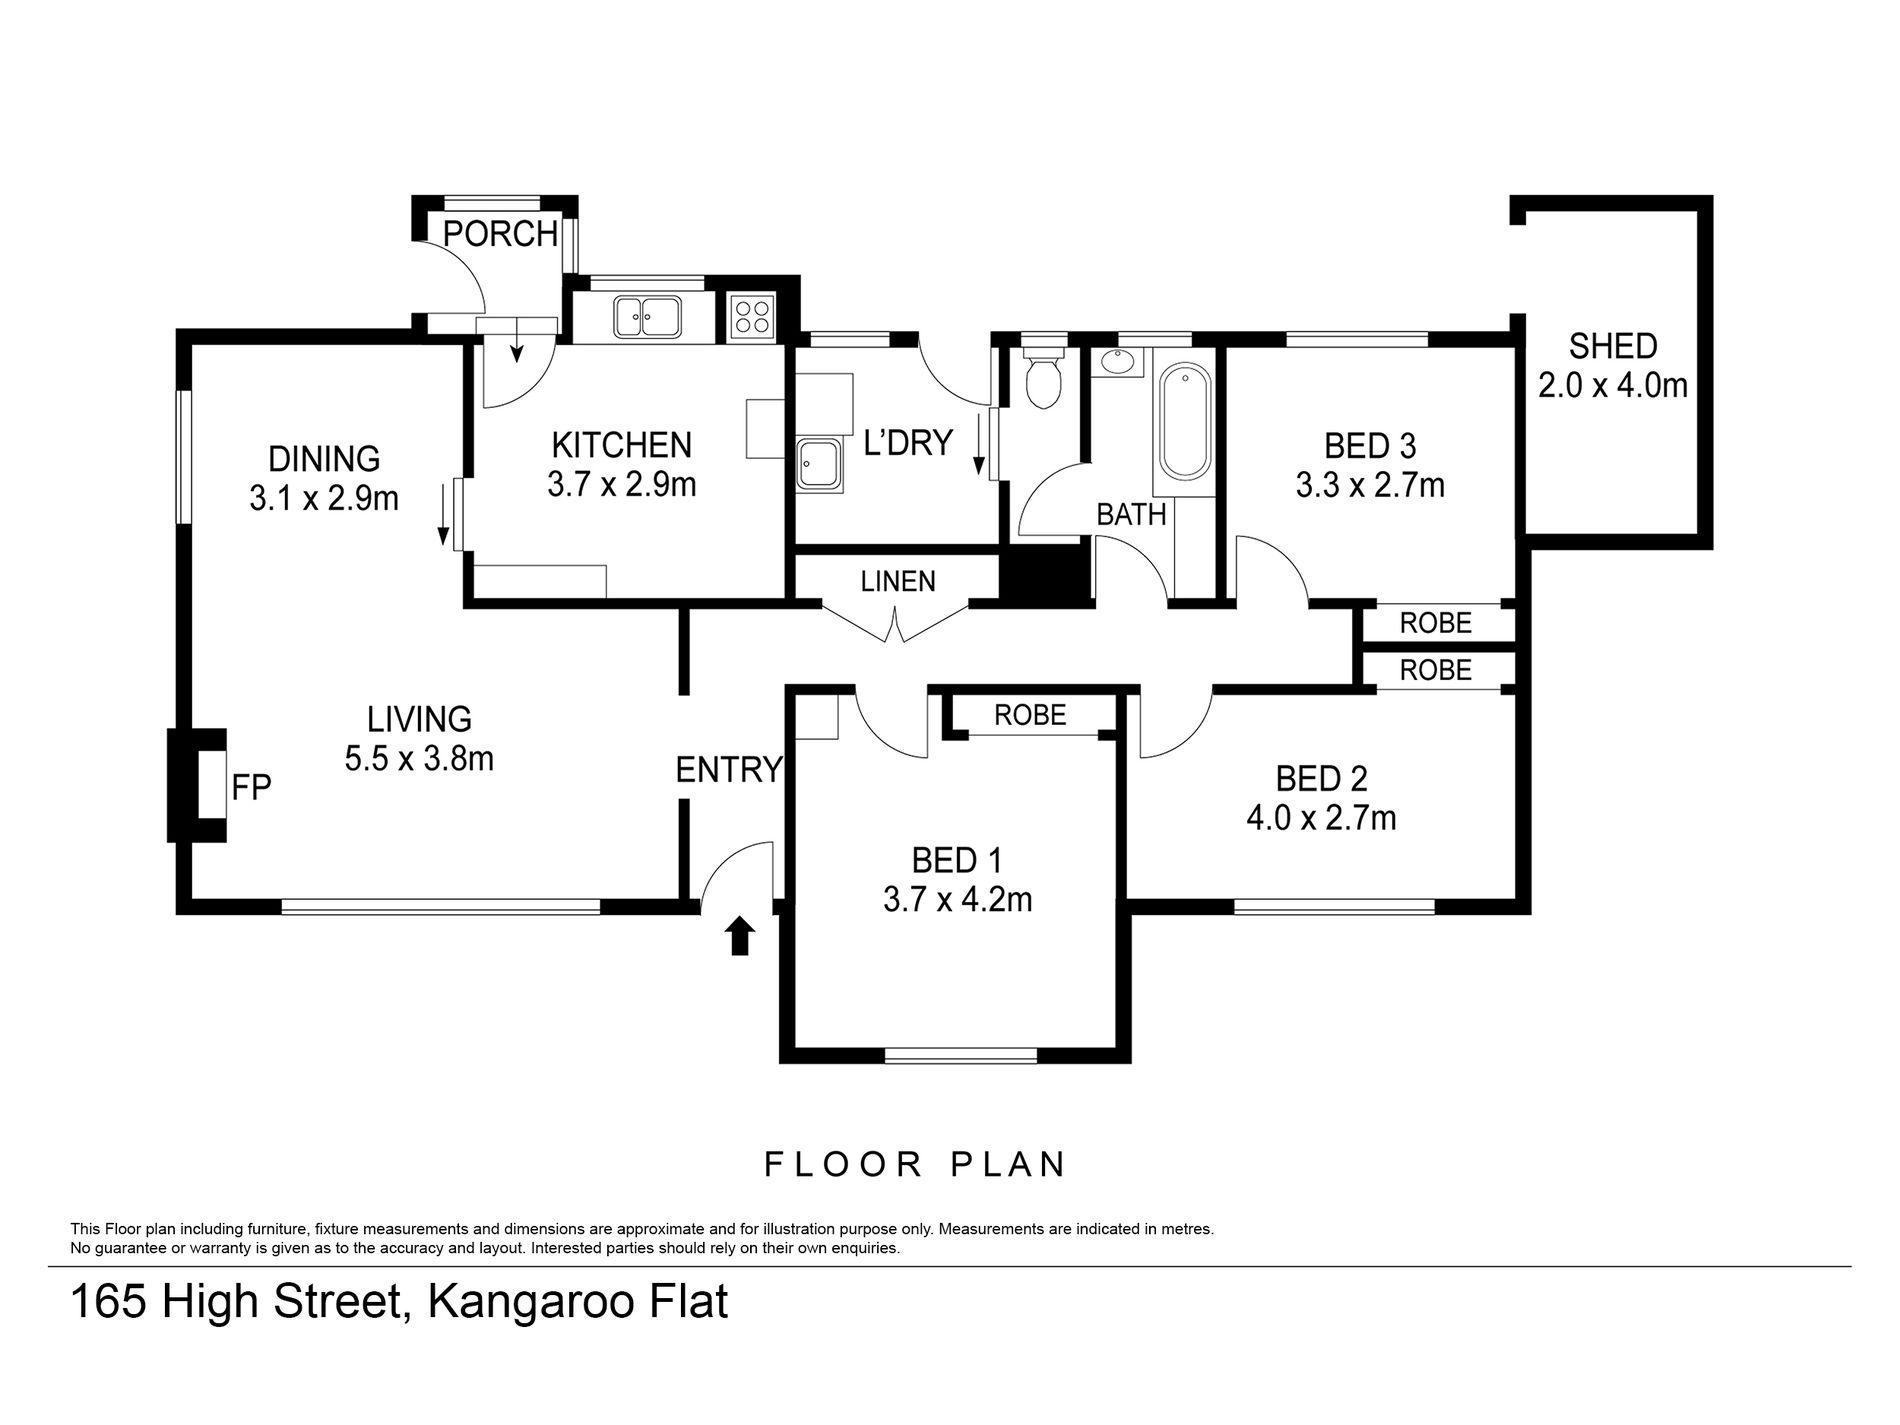 165 High Street, Kangaroo Flat